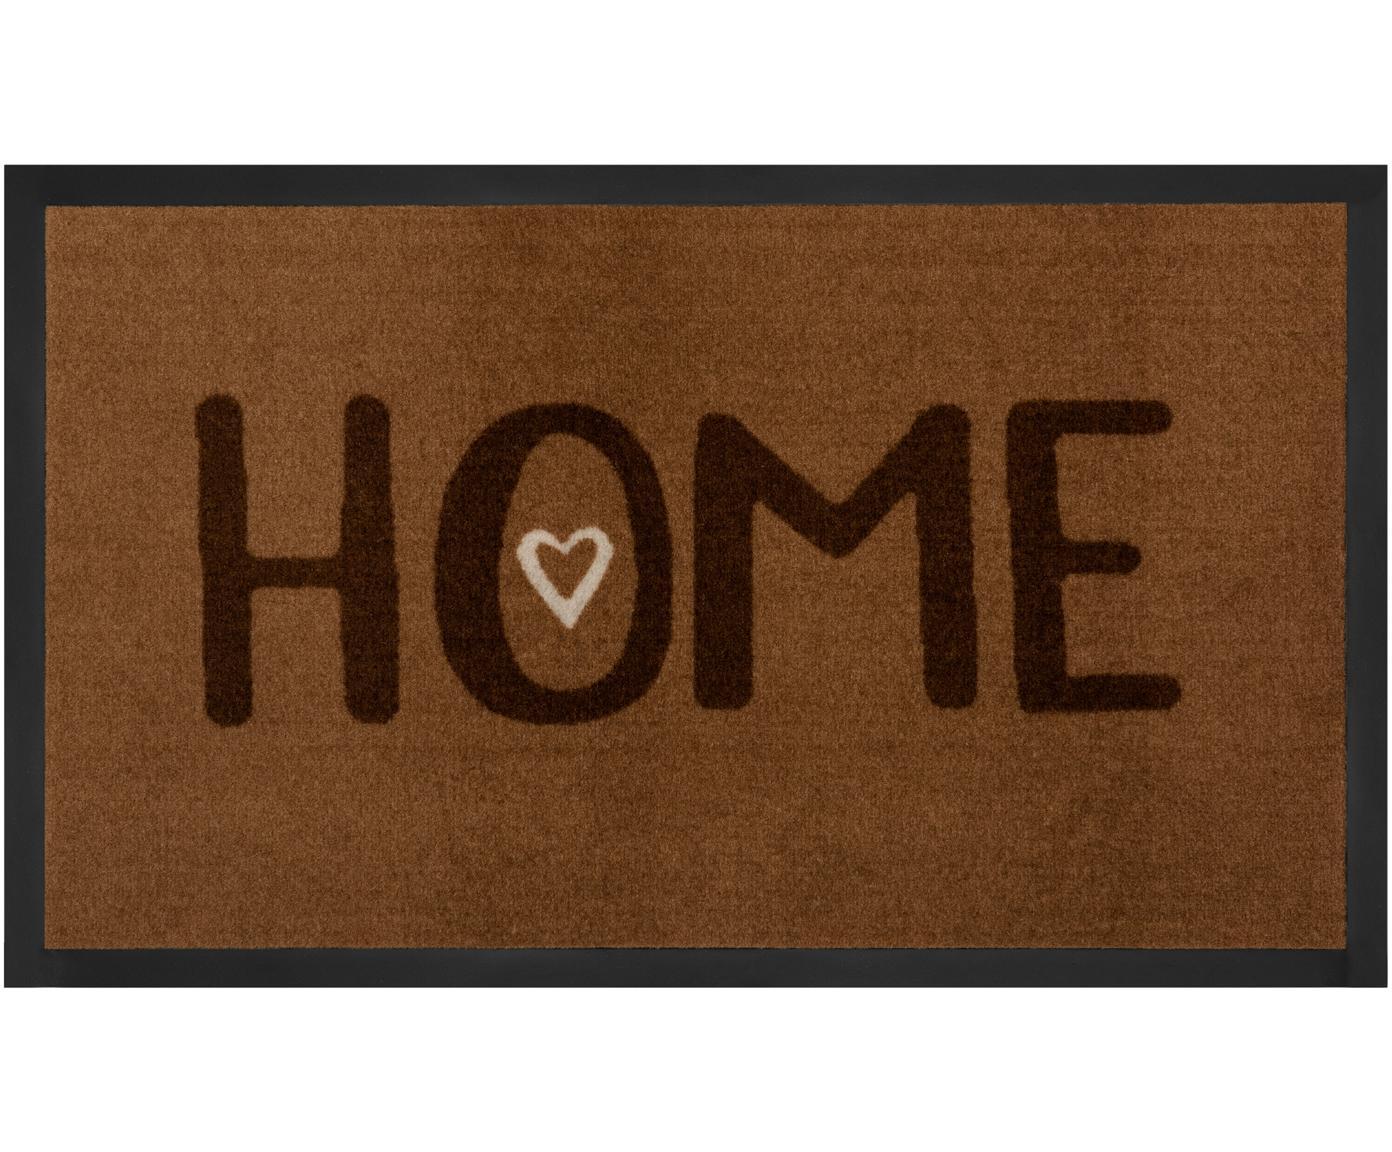 Polyamide deurmat Lovely Home, Bovenzijde: polyamide, Onderzijde: rubber, Bruintinten, 45 x 75 cm